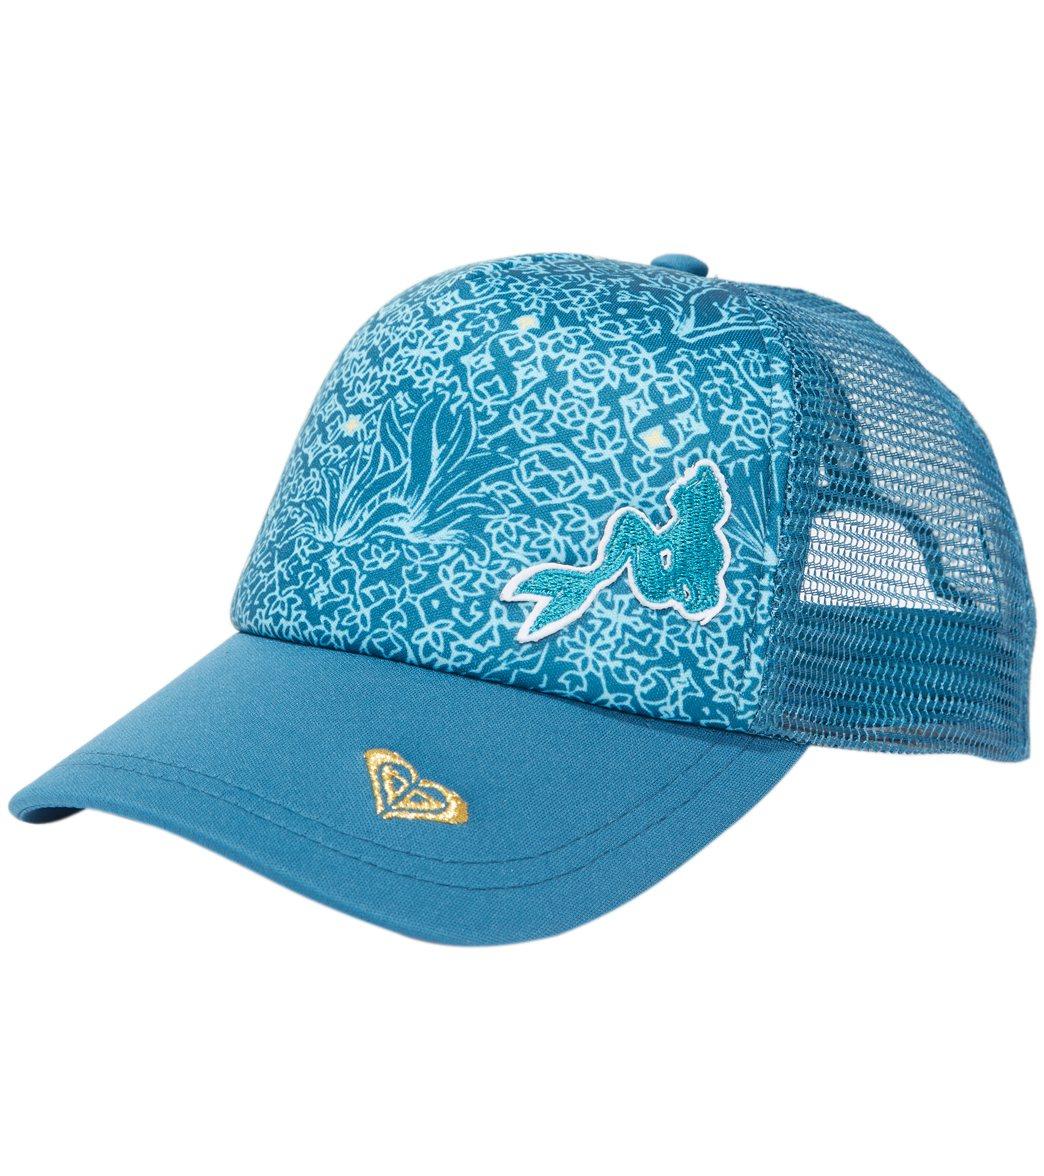 f40eed94d Disney x Roxy Girls' Reggae Town Trucker Hat